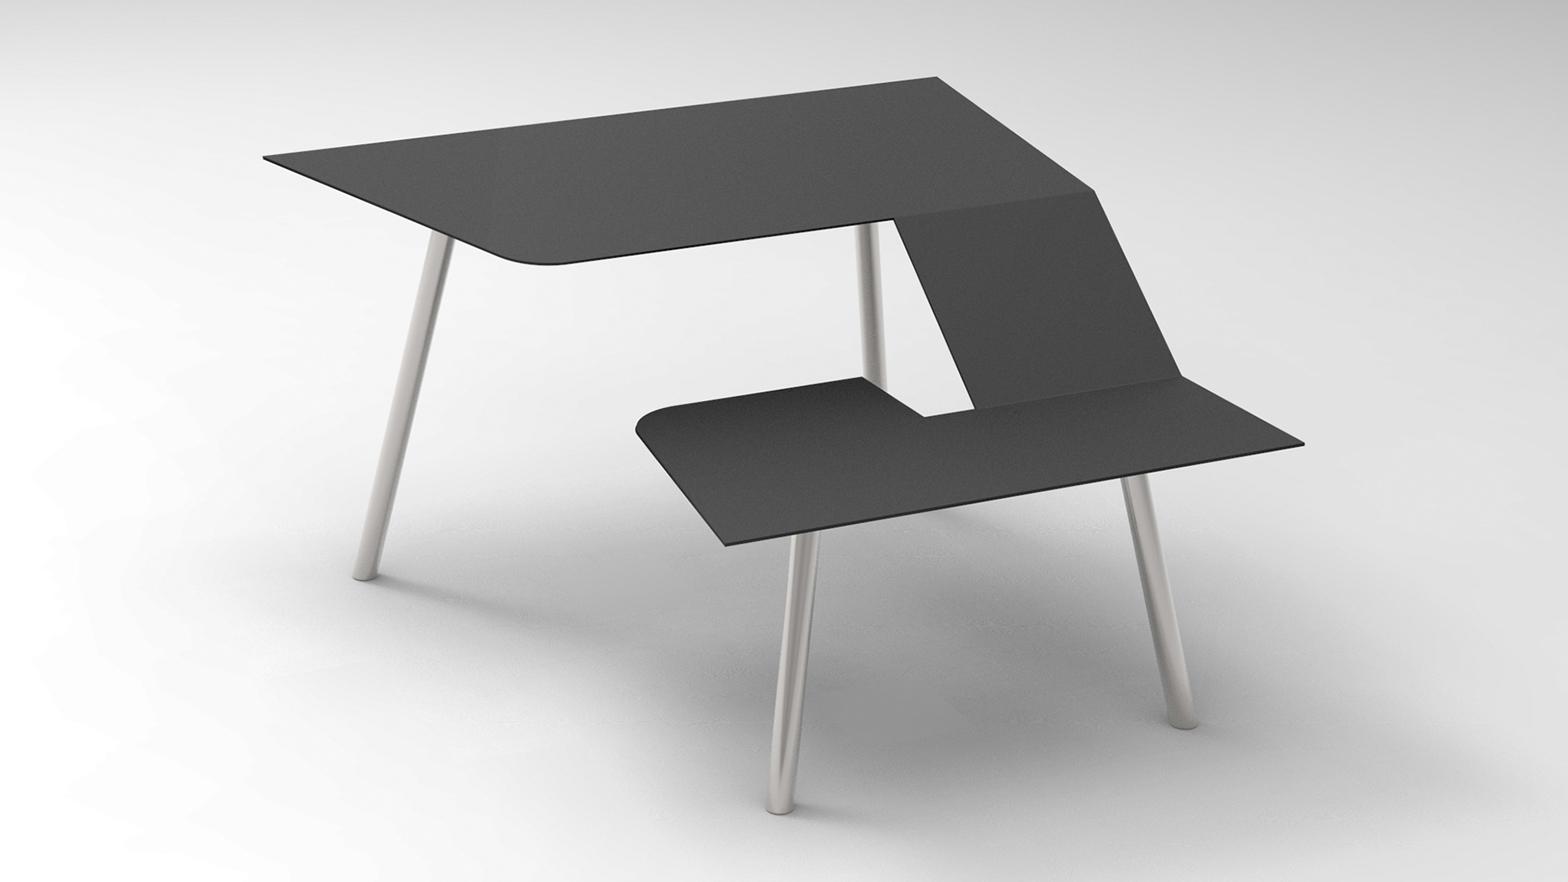 frans willigers addresses useless work furniture with hybrid desk